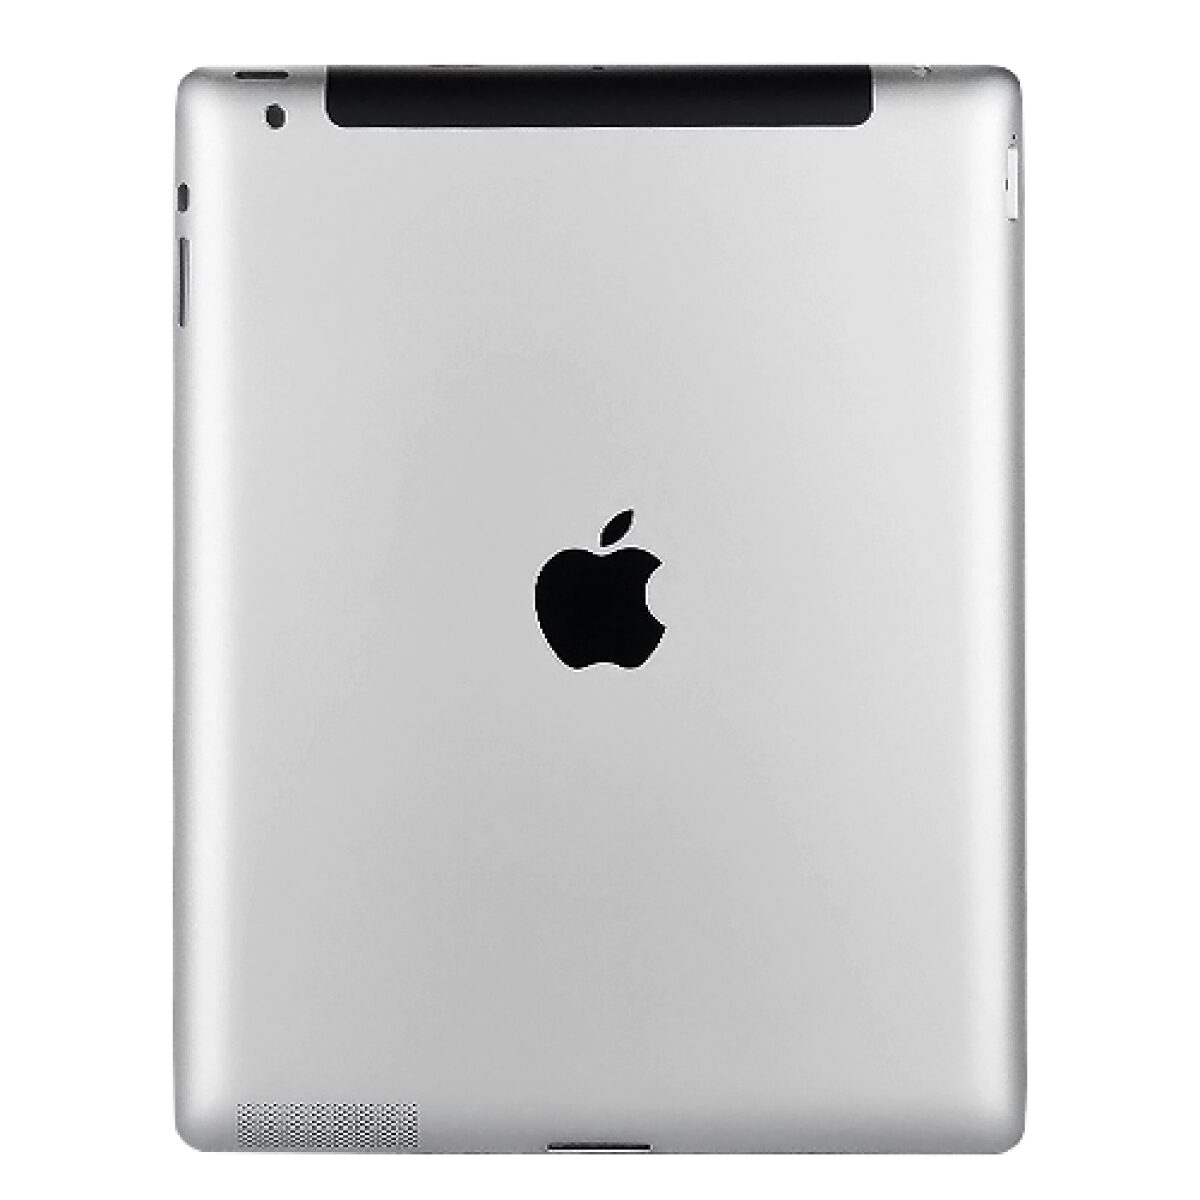 Apple IPad 2 Tablet 32GB 9.7inch Wifi Webcam Black Sale